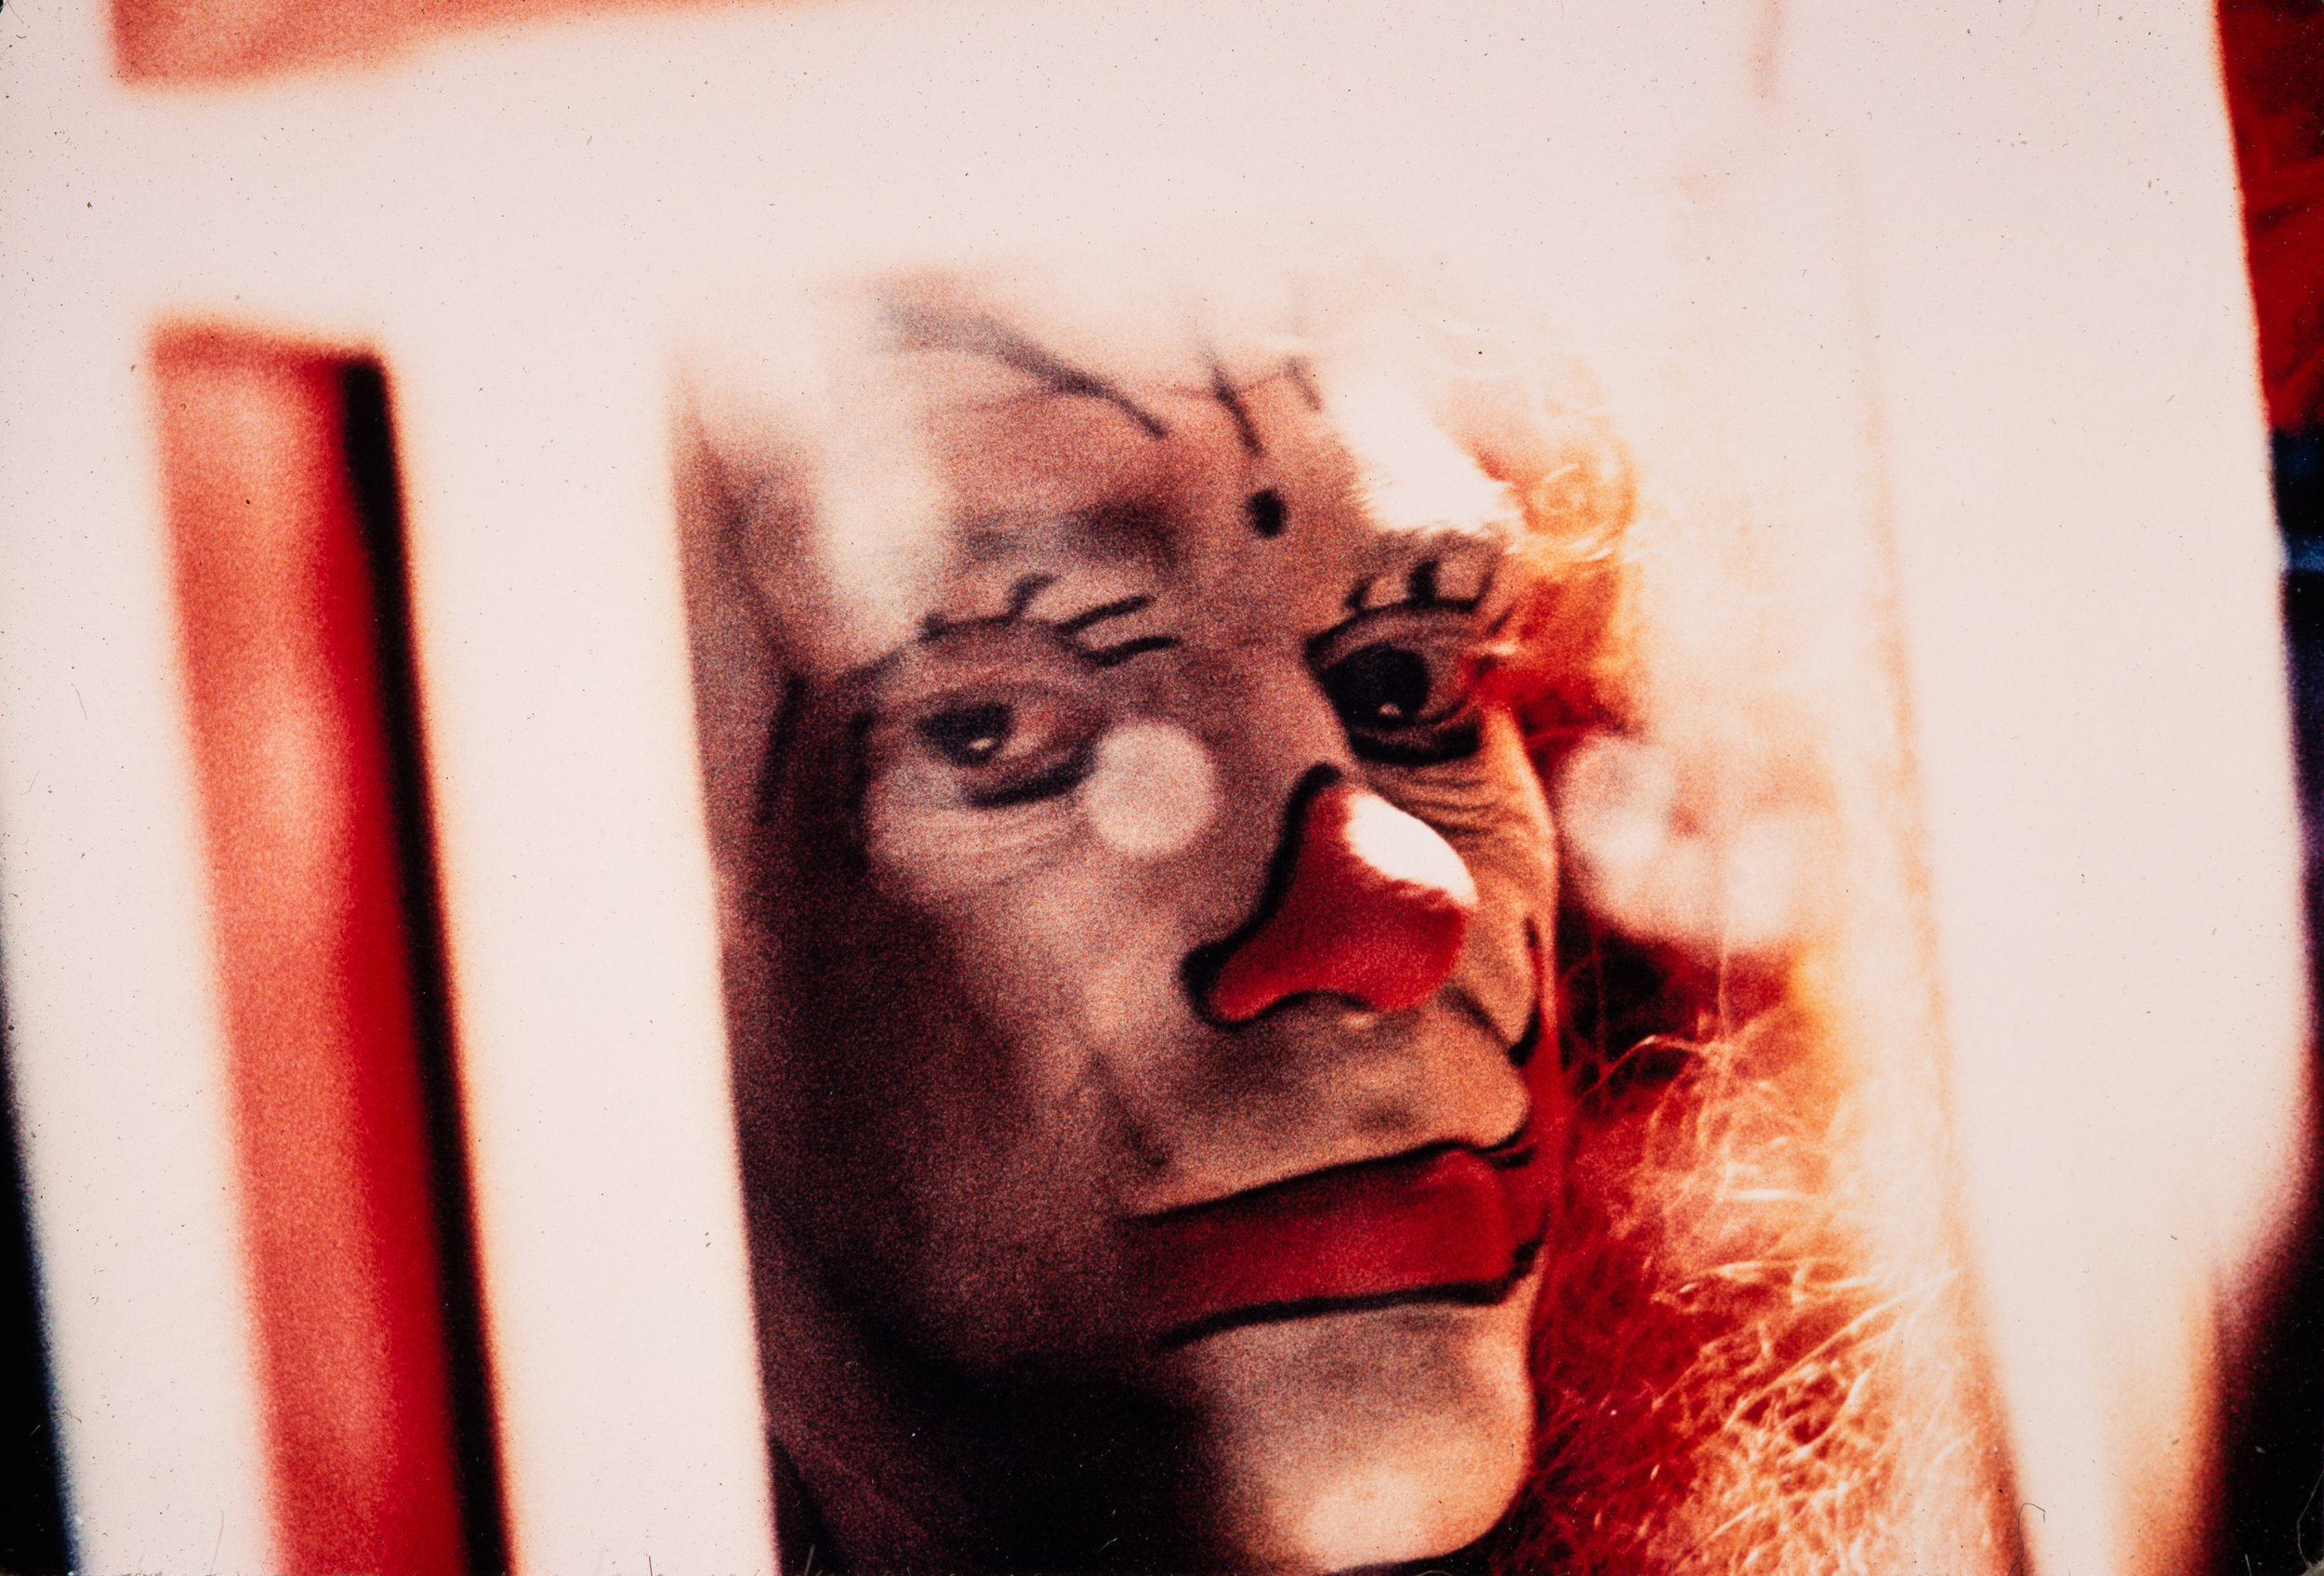 Clown portrait #3, NYC, 1959